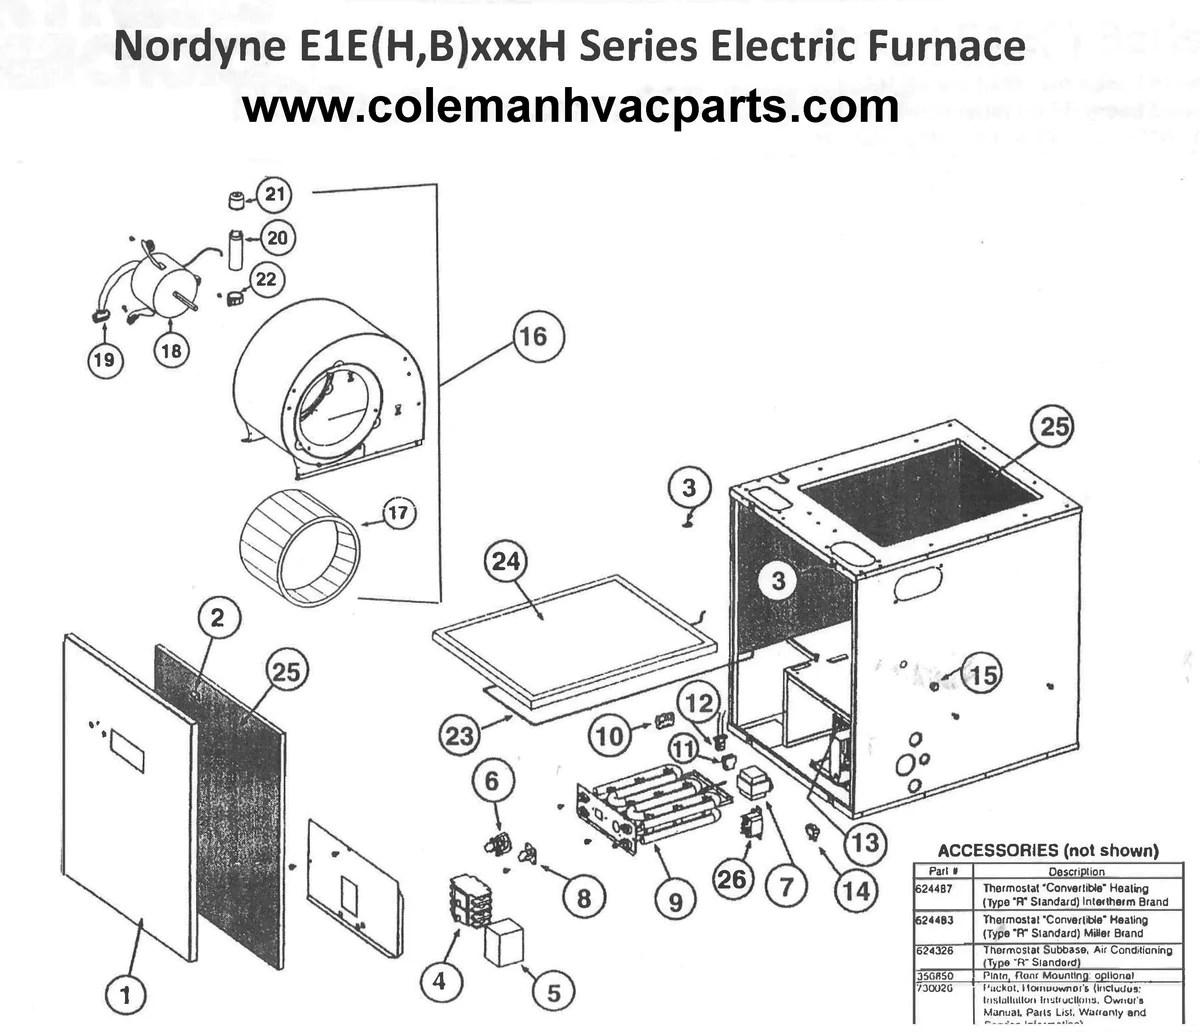 intertherm model e1eb 015ha furnace wiring diagram [ 1199 x 1032 Pixel ]